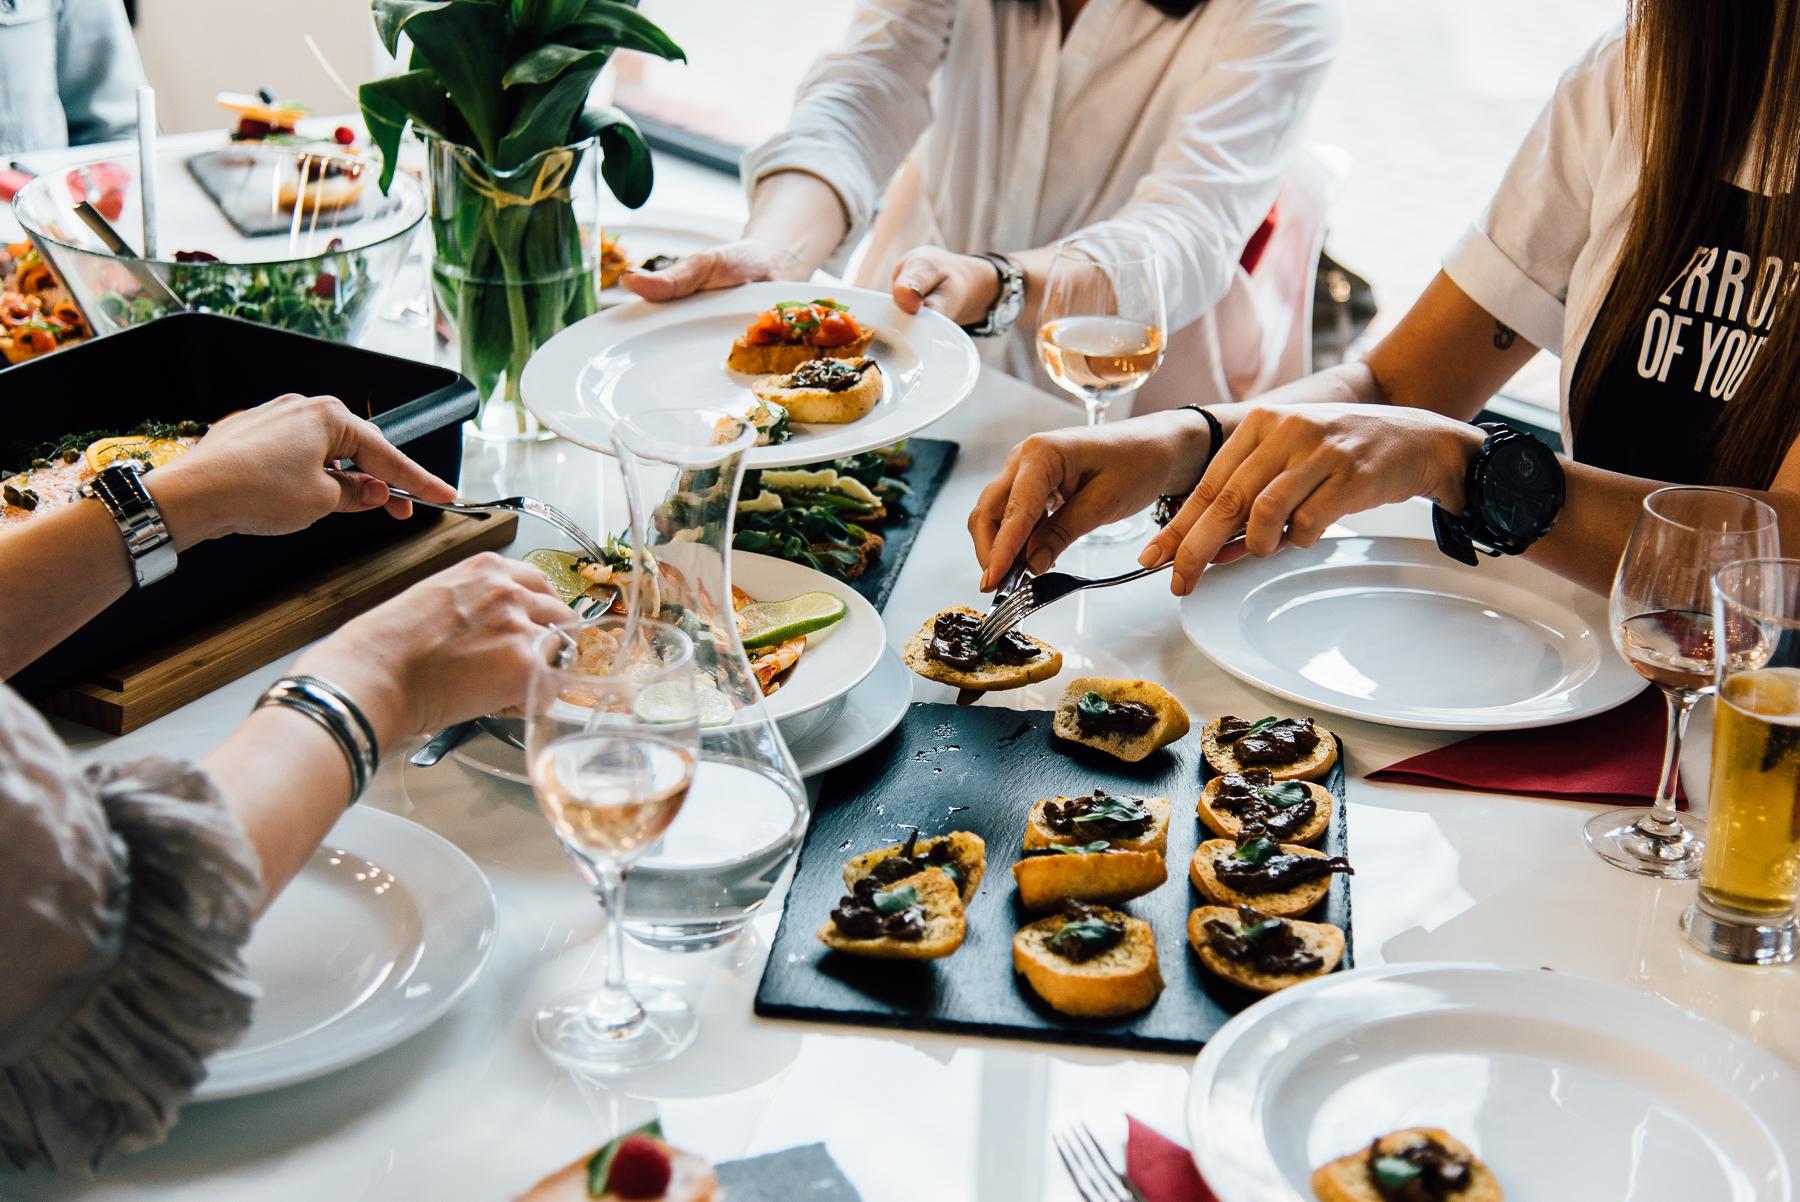 UNprivate dinner: Miele & Friends